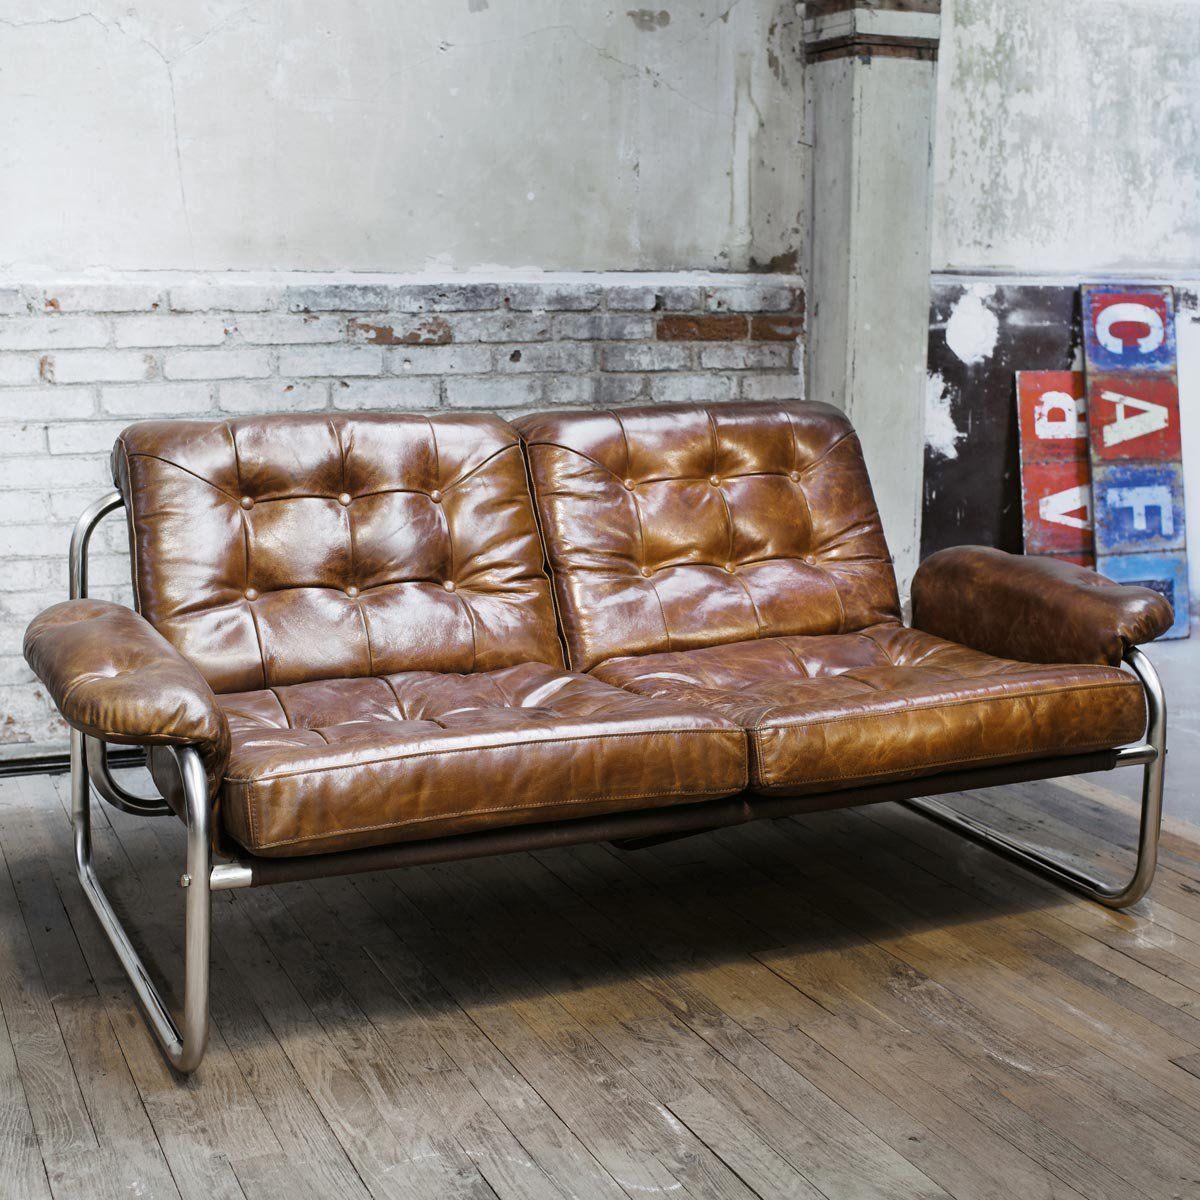 2 sitzer vintage polsterbank aus leder braun gary sofa vintage sofa sofa furniture sofa